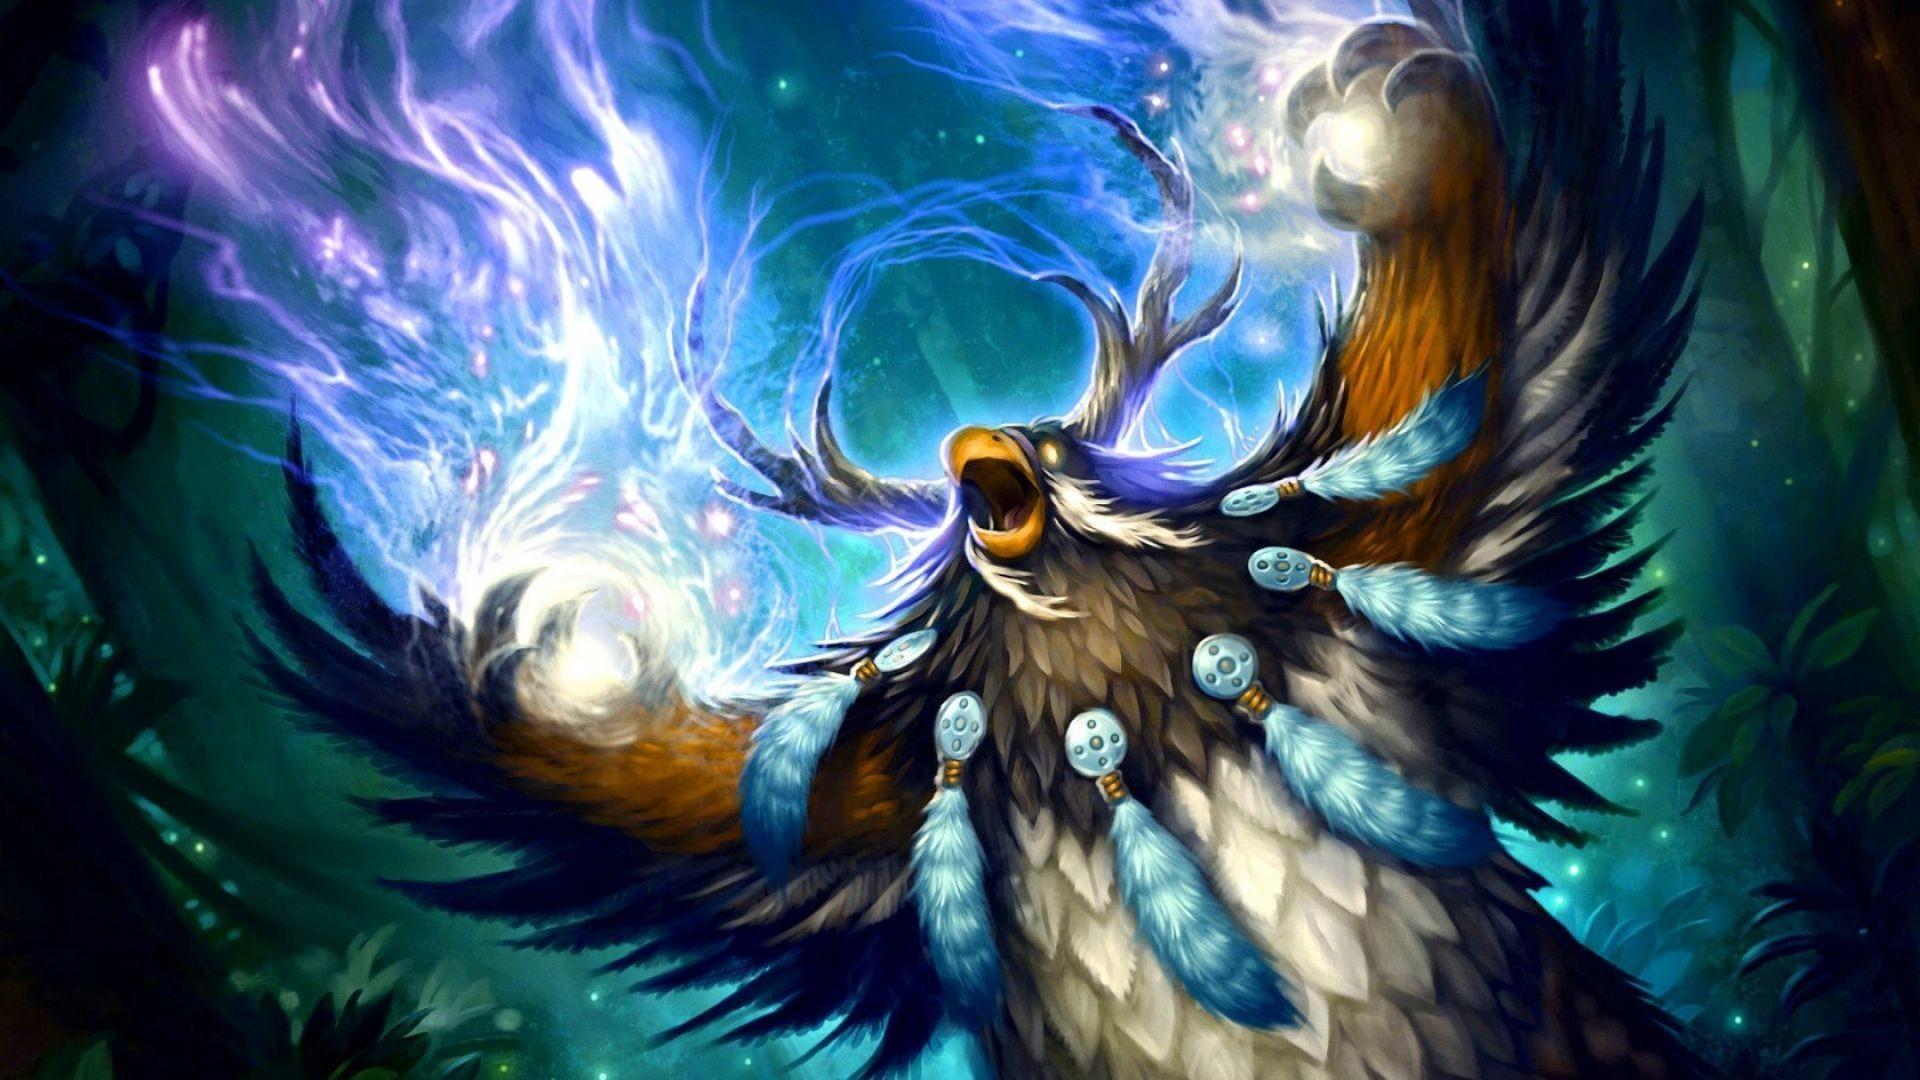 1920x1080 World of Warcraft | World of Warcraft wow desktop Full HD Wallpapers and Desktop Backgrounds